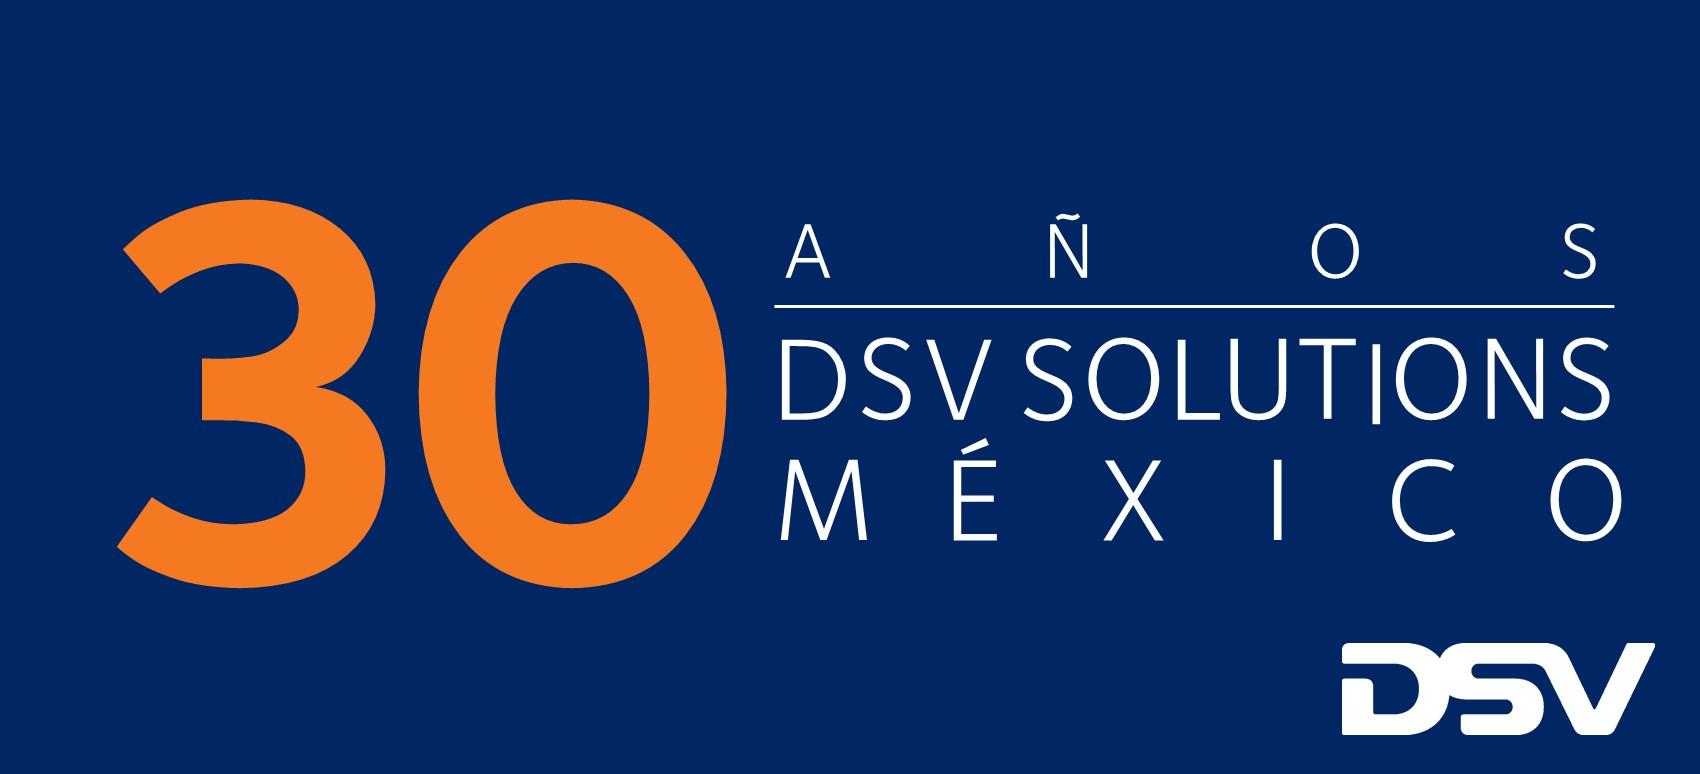 30 aniversario de DSV Solutions en México